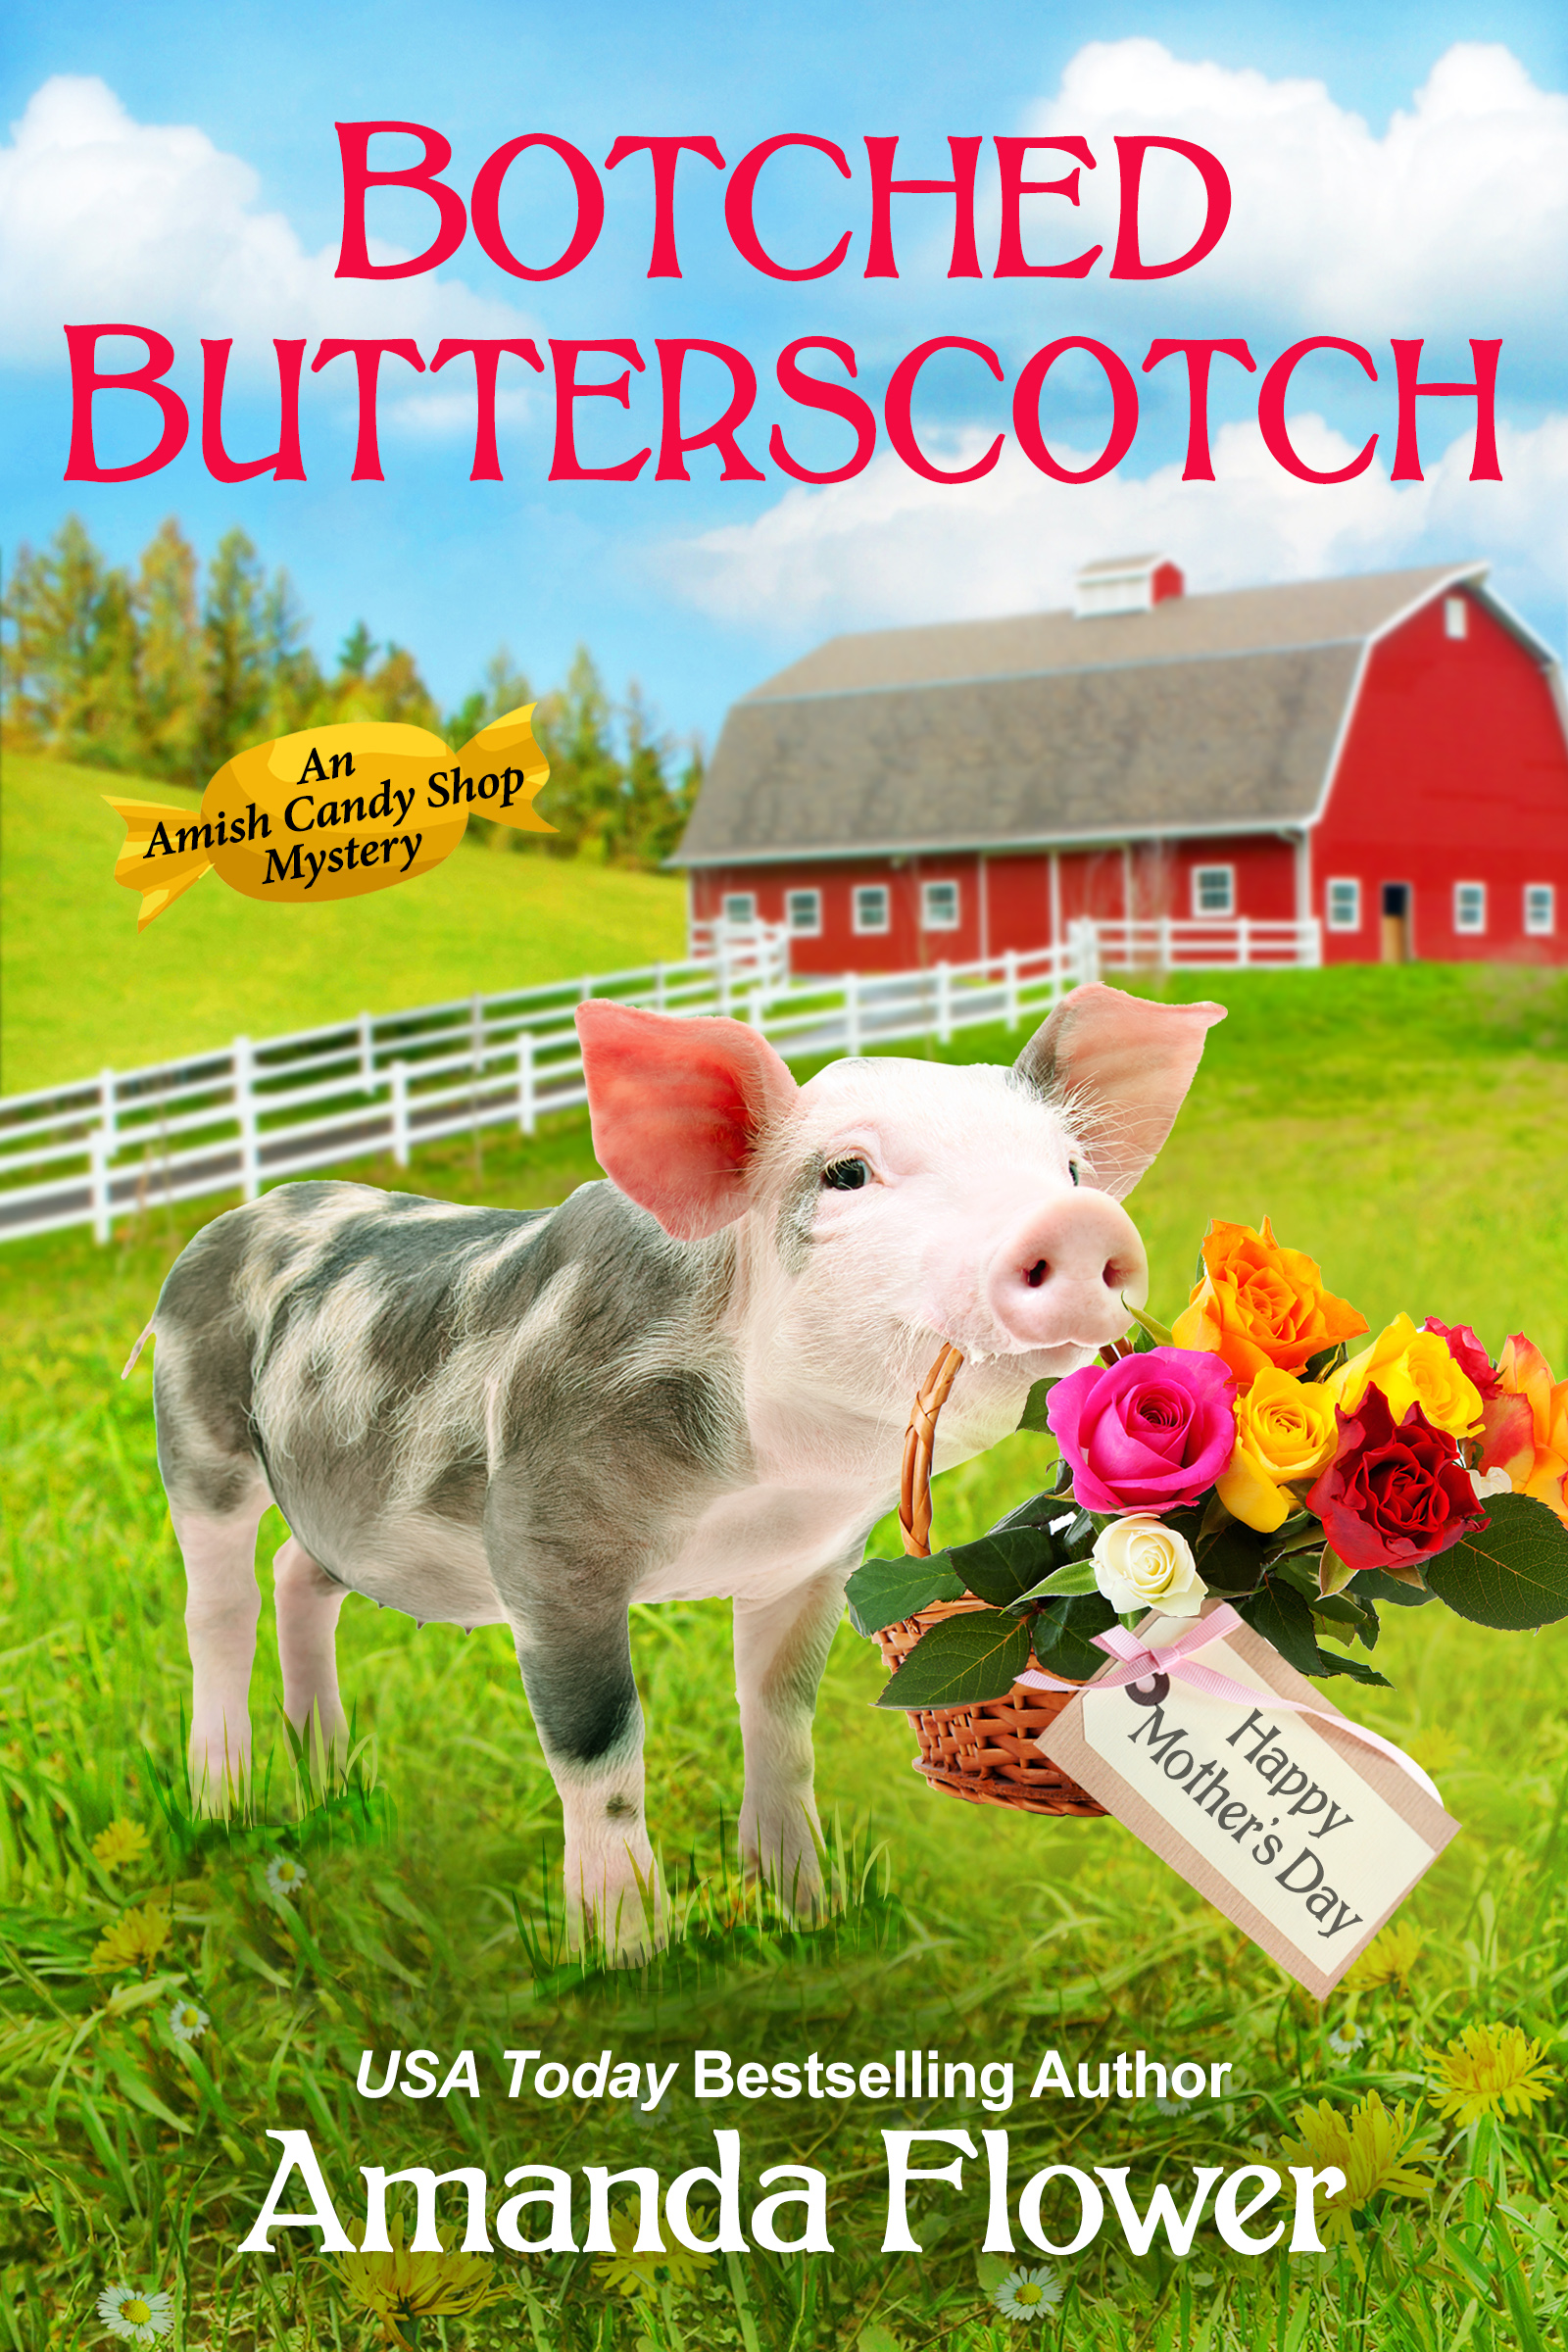 Botched Butterscotch by Amanda Flower